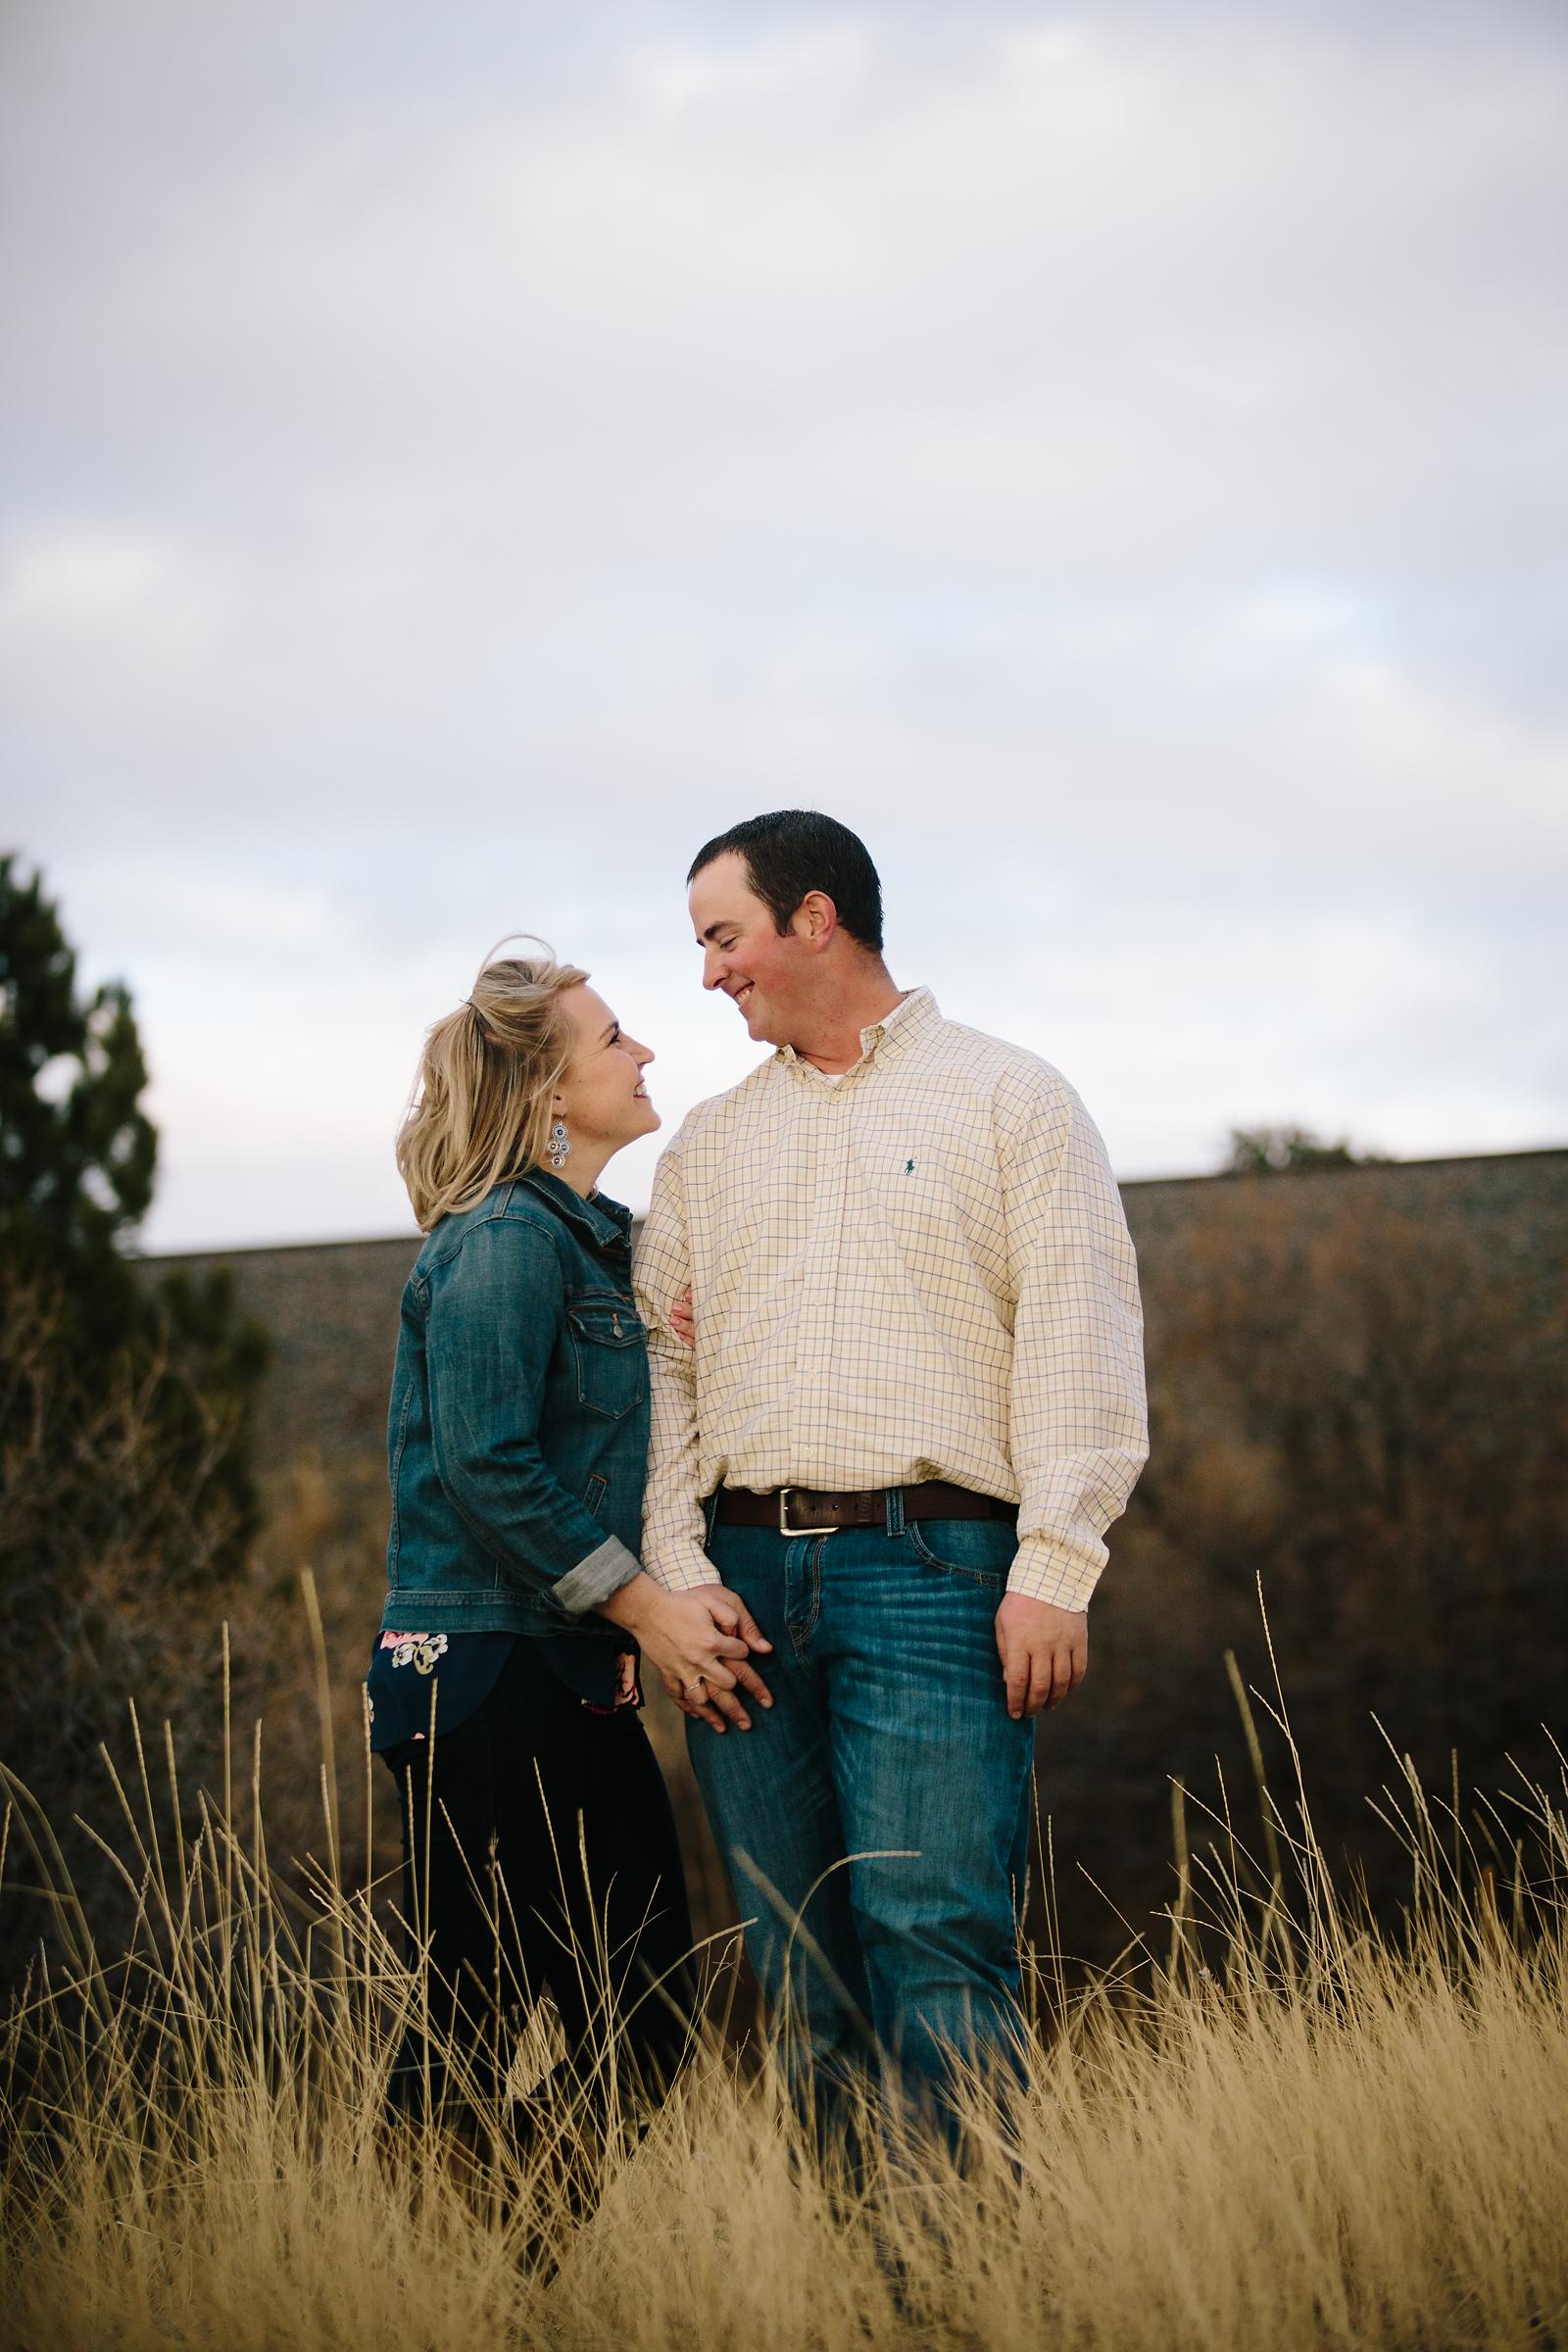 Colorado Engagement, Castle Rock, Photography, Adam Pacheco Photography104.JPG